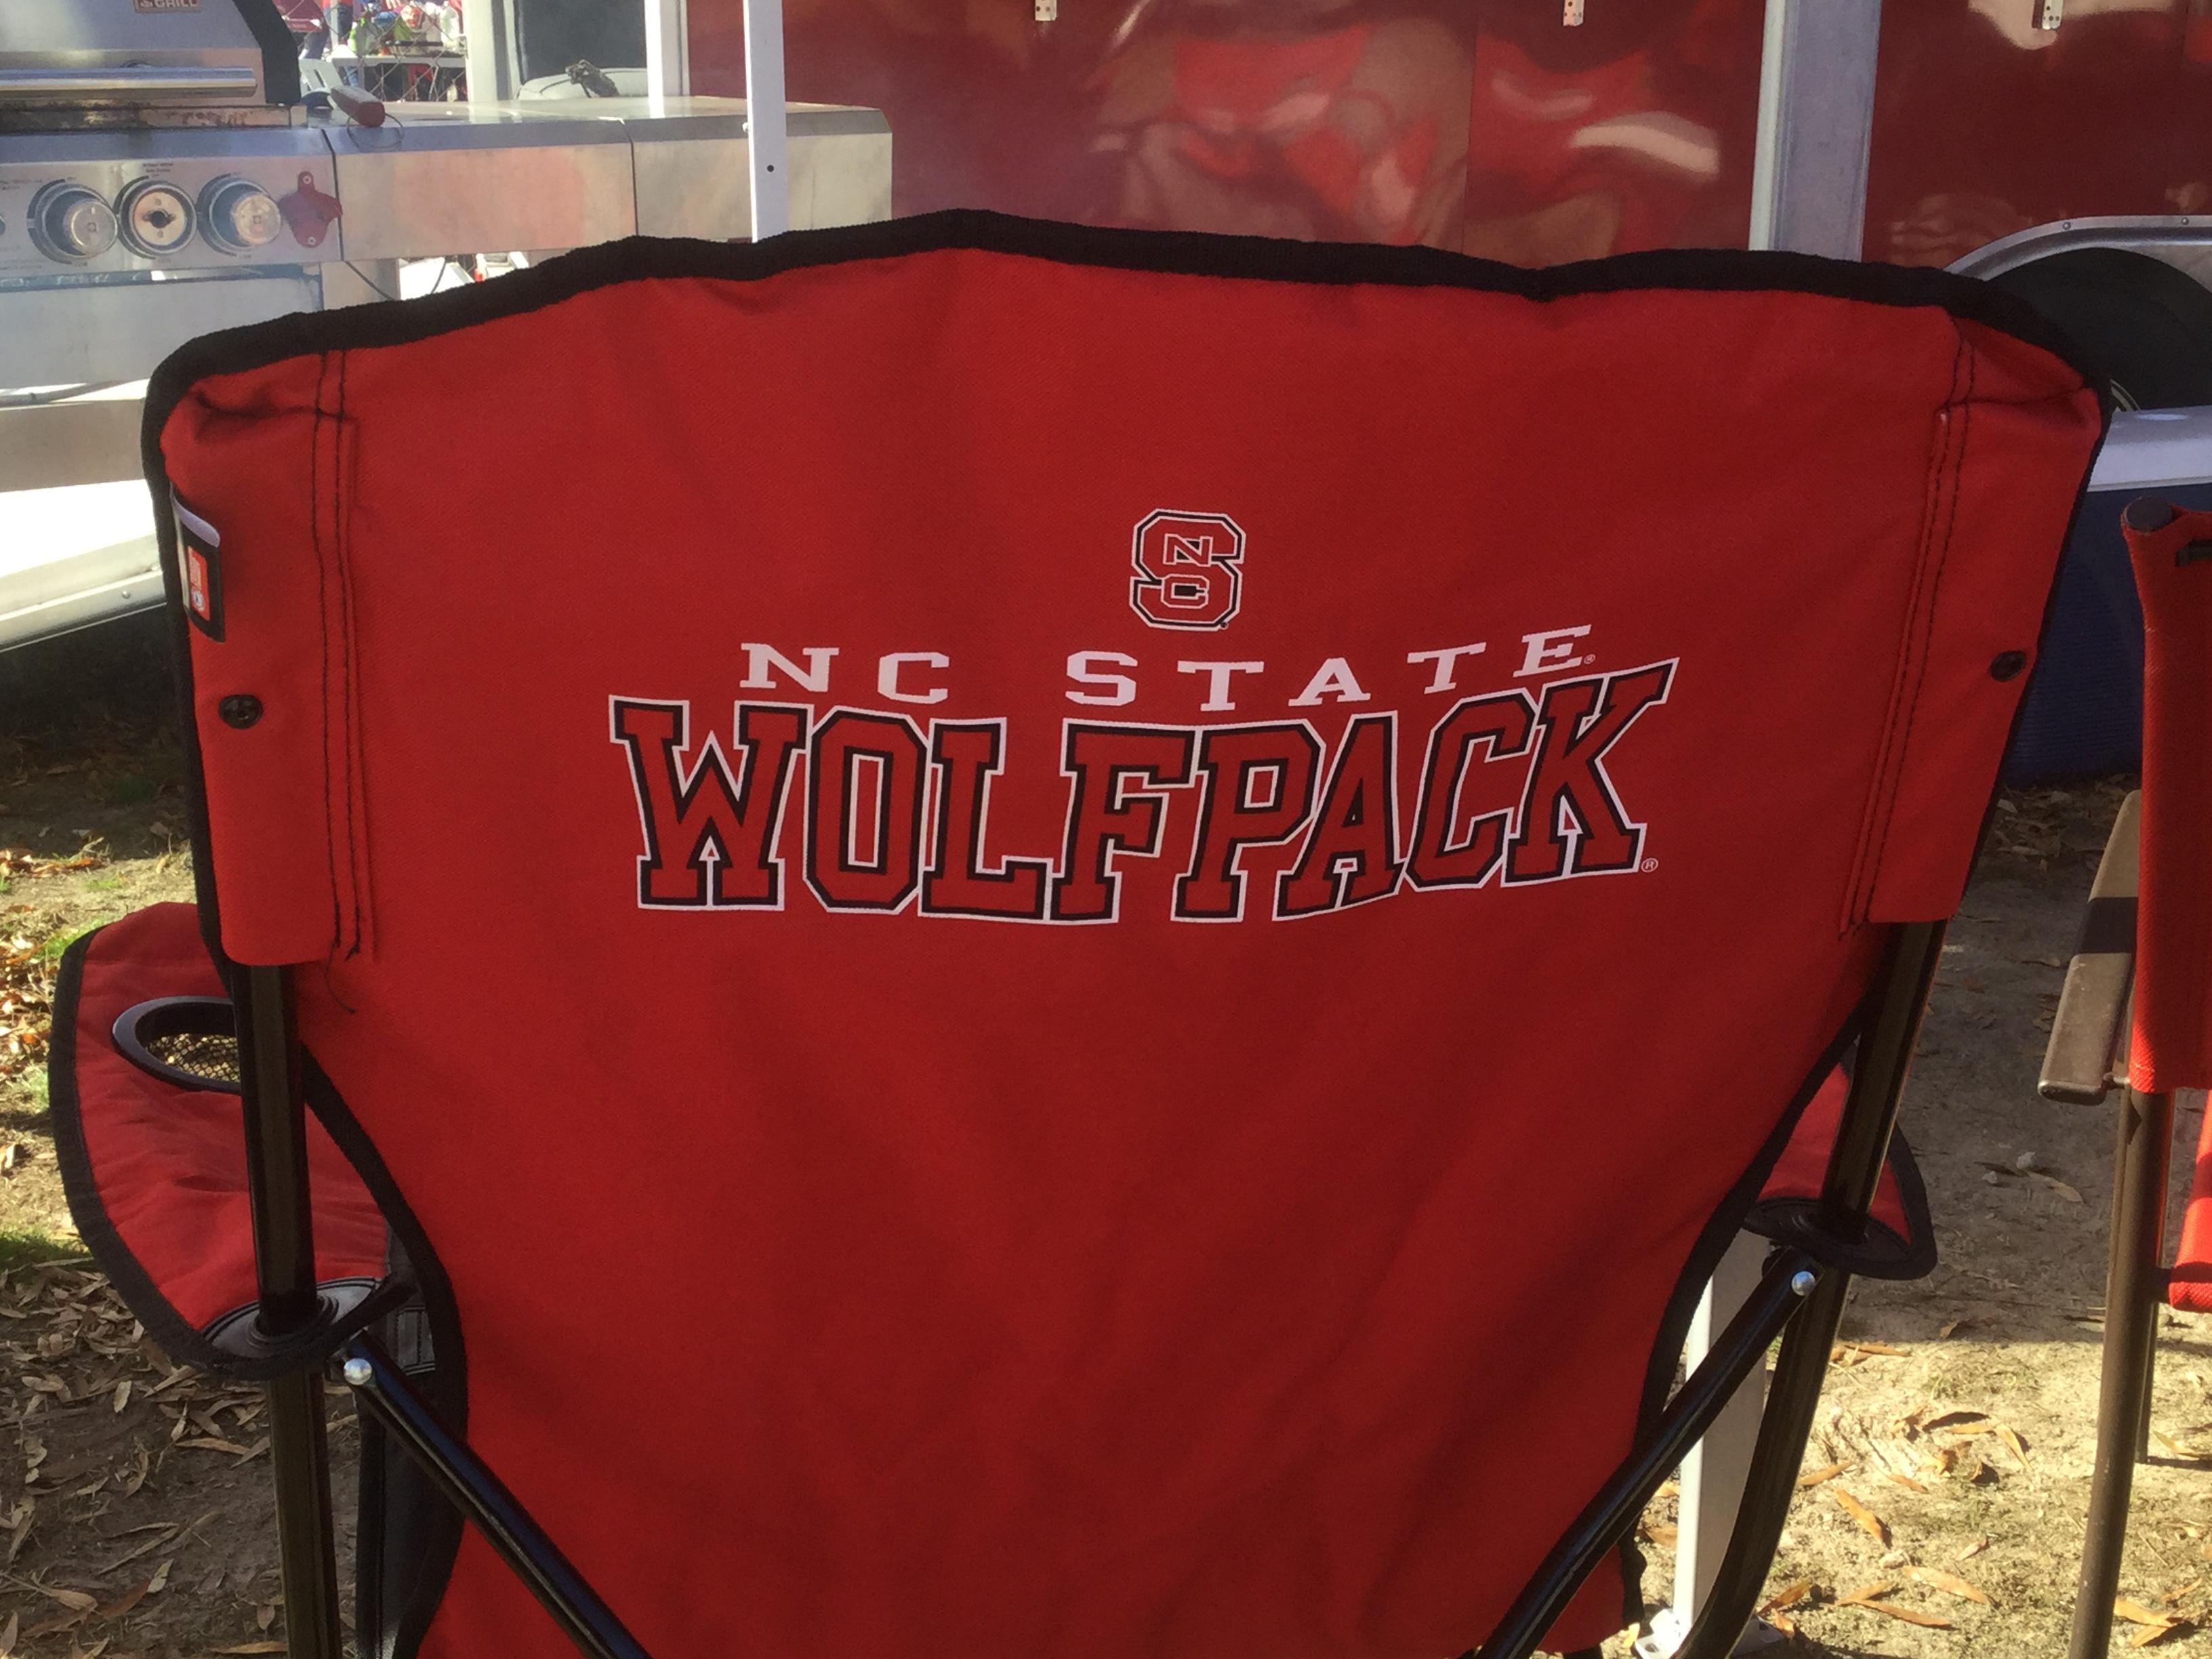 Tailgate Party NC State vs Univ of North Carolina